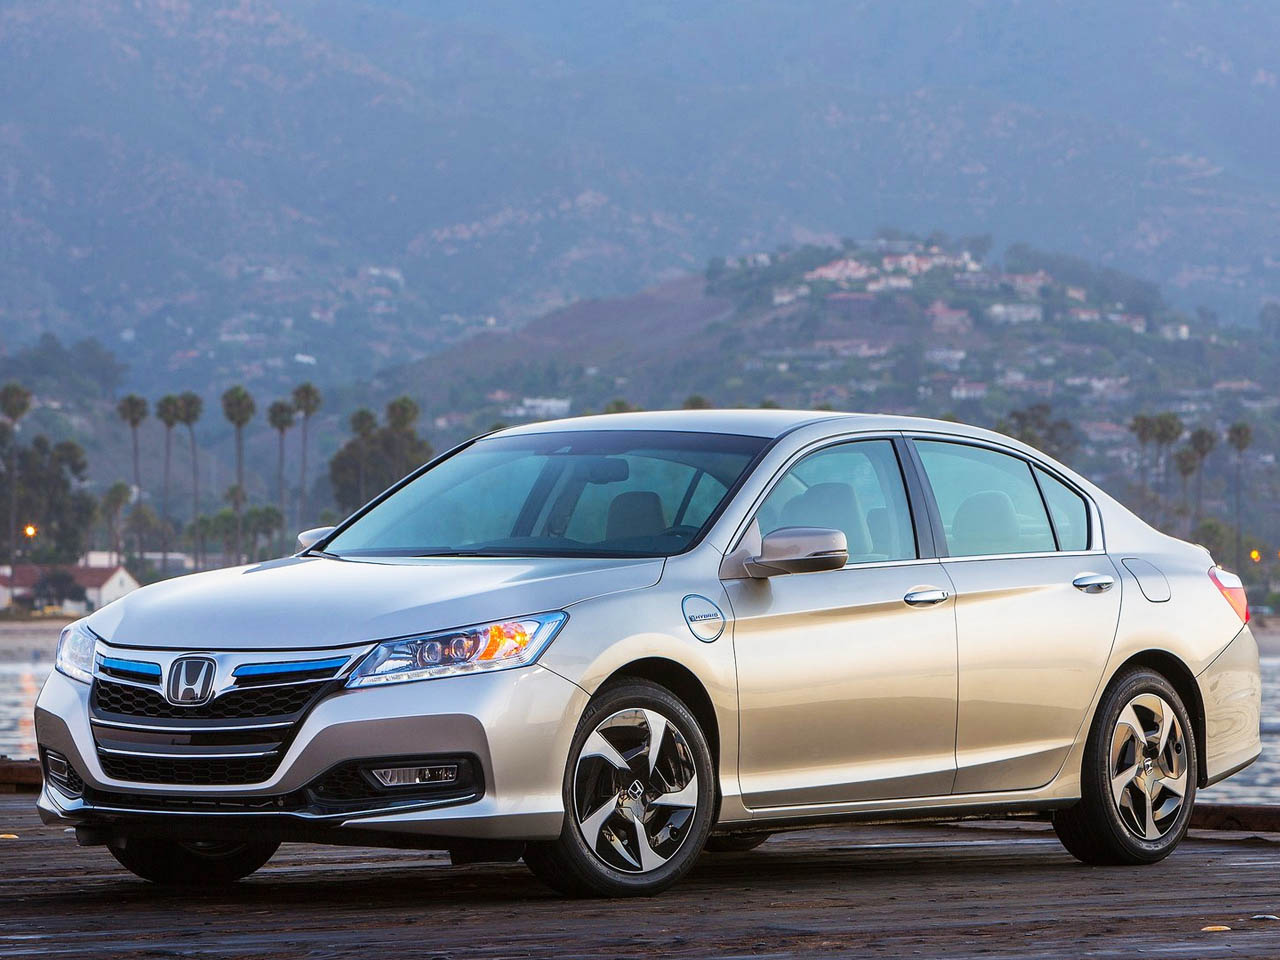 2014 honda accord hybrid technology version views car for Honda hybrid vehicles